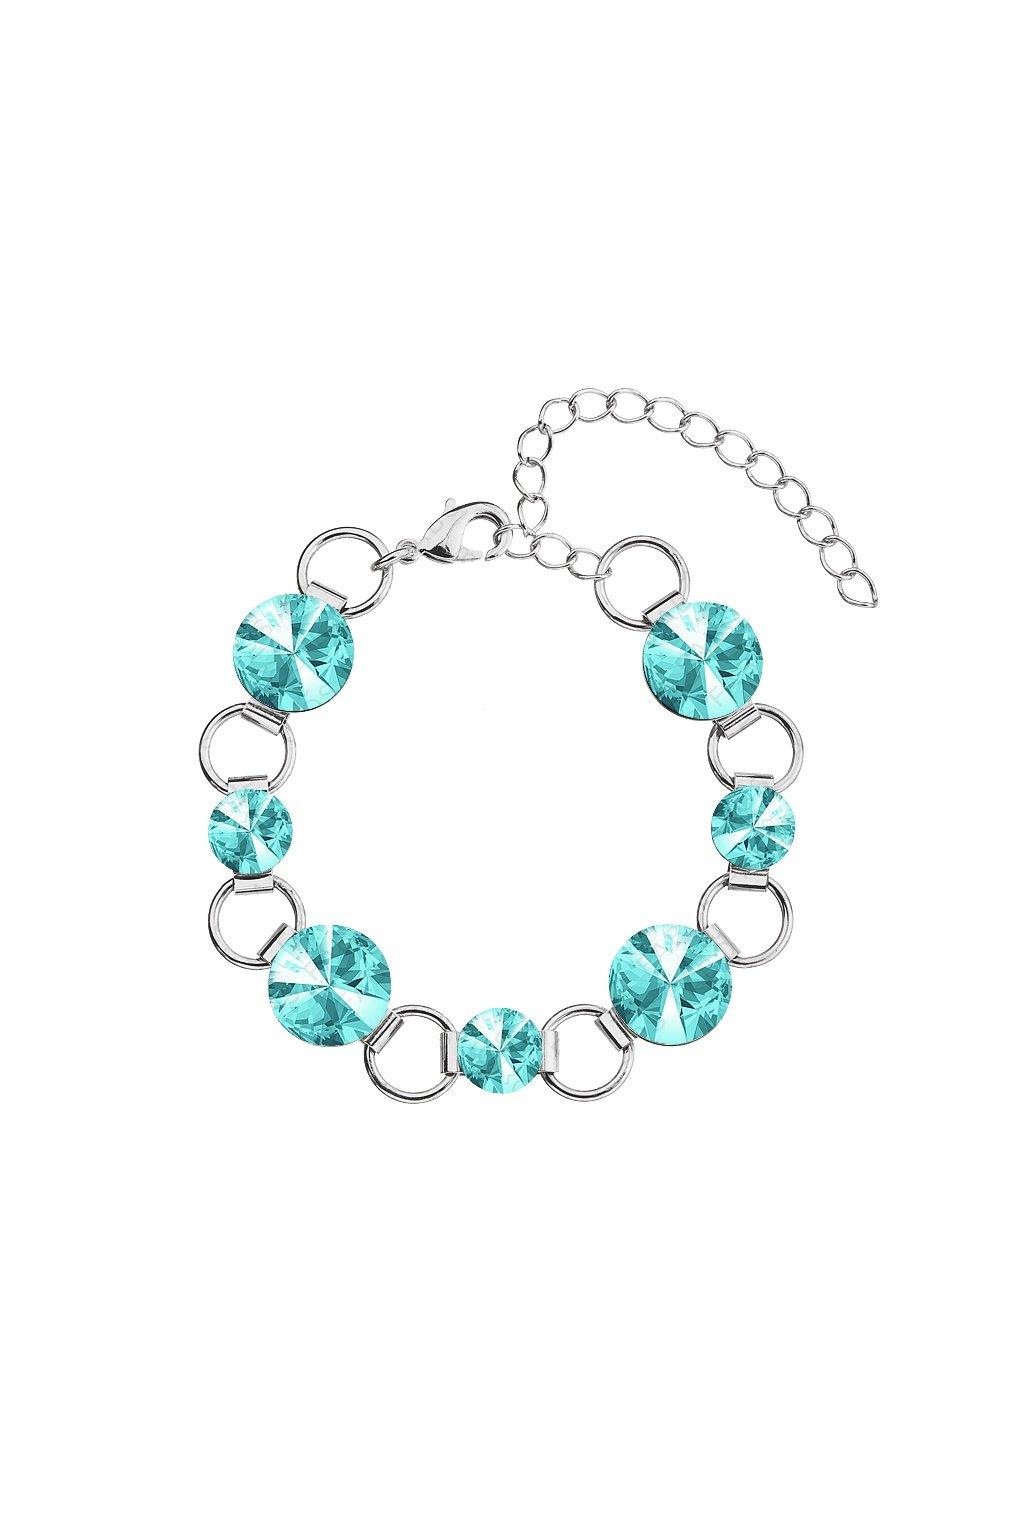 Náramek Rivoli 8-12 Turquoise Swarovski elements